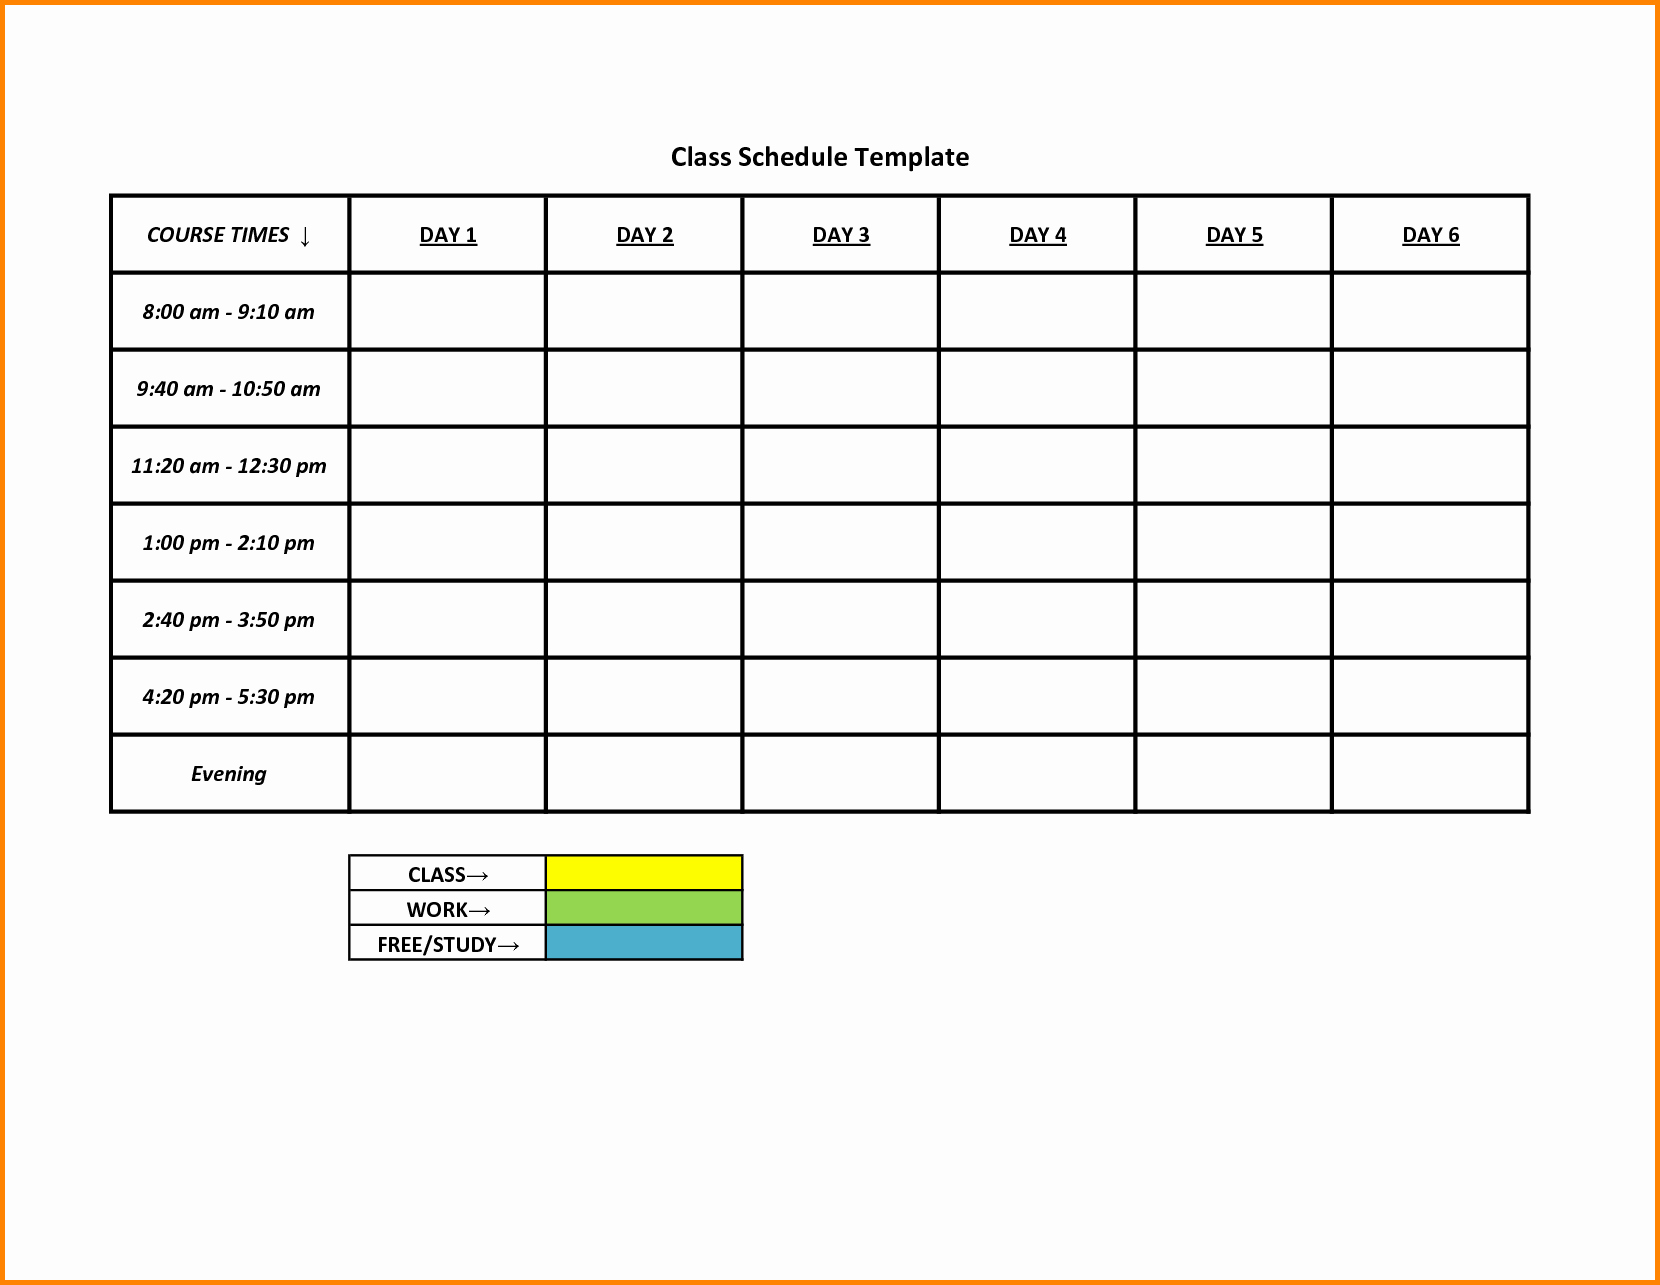 5 Day Schedule Template Portablegasgrillweber